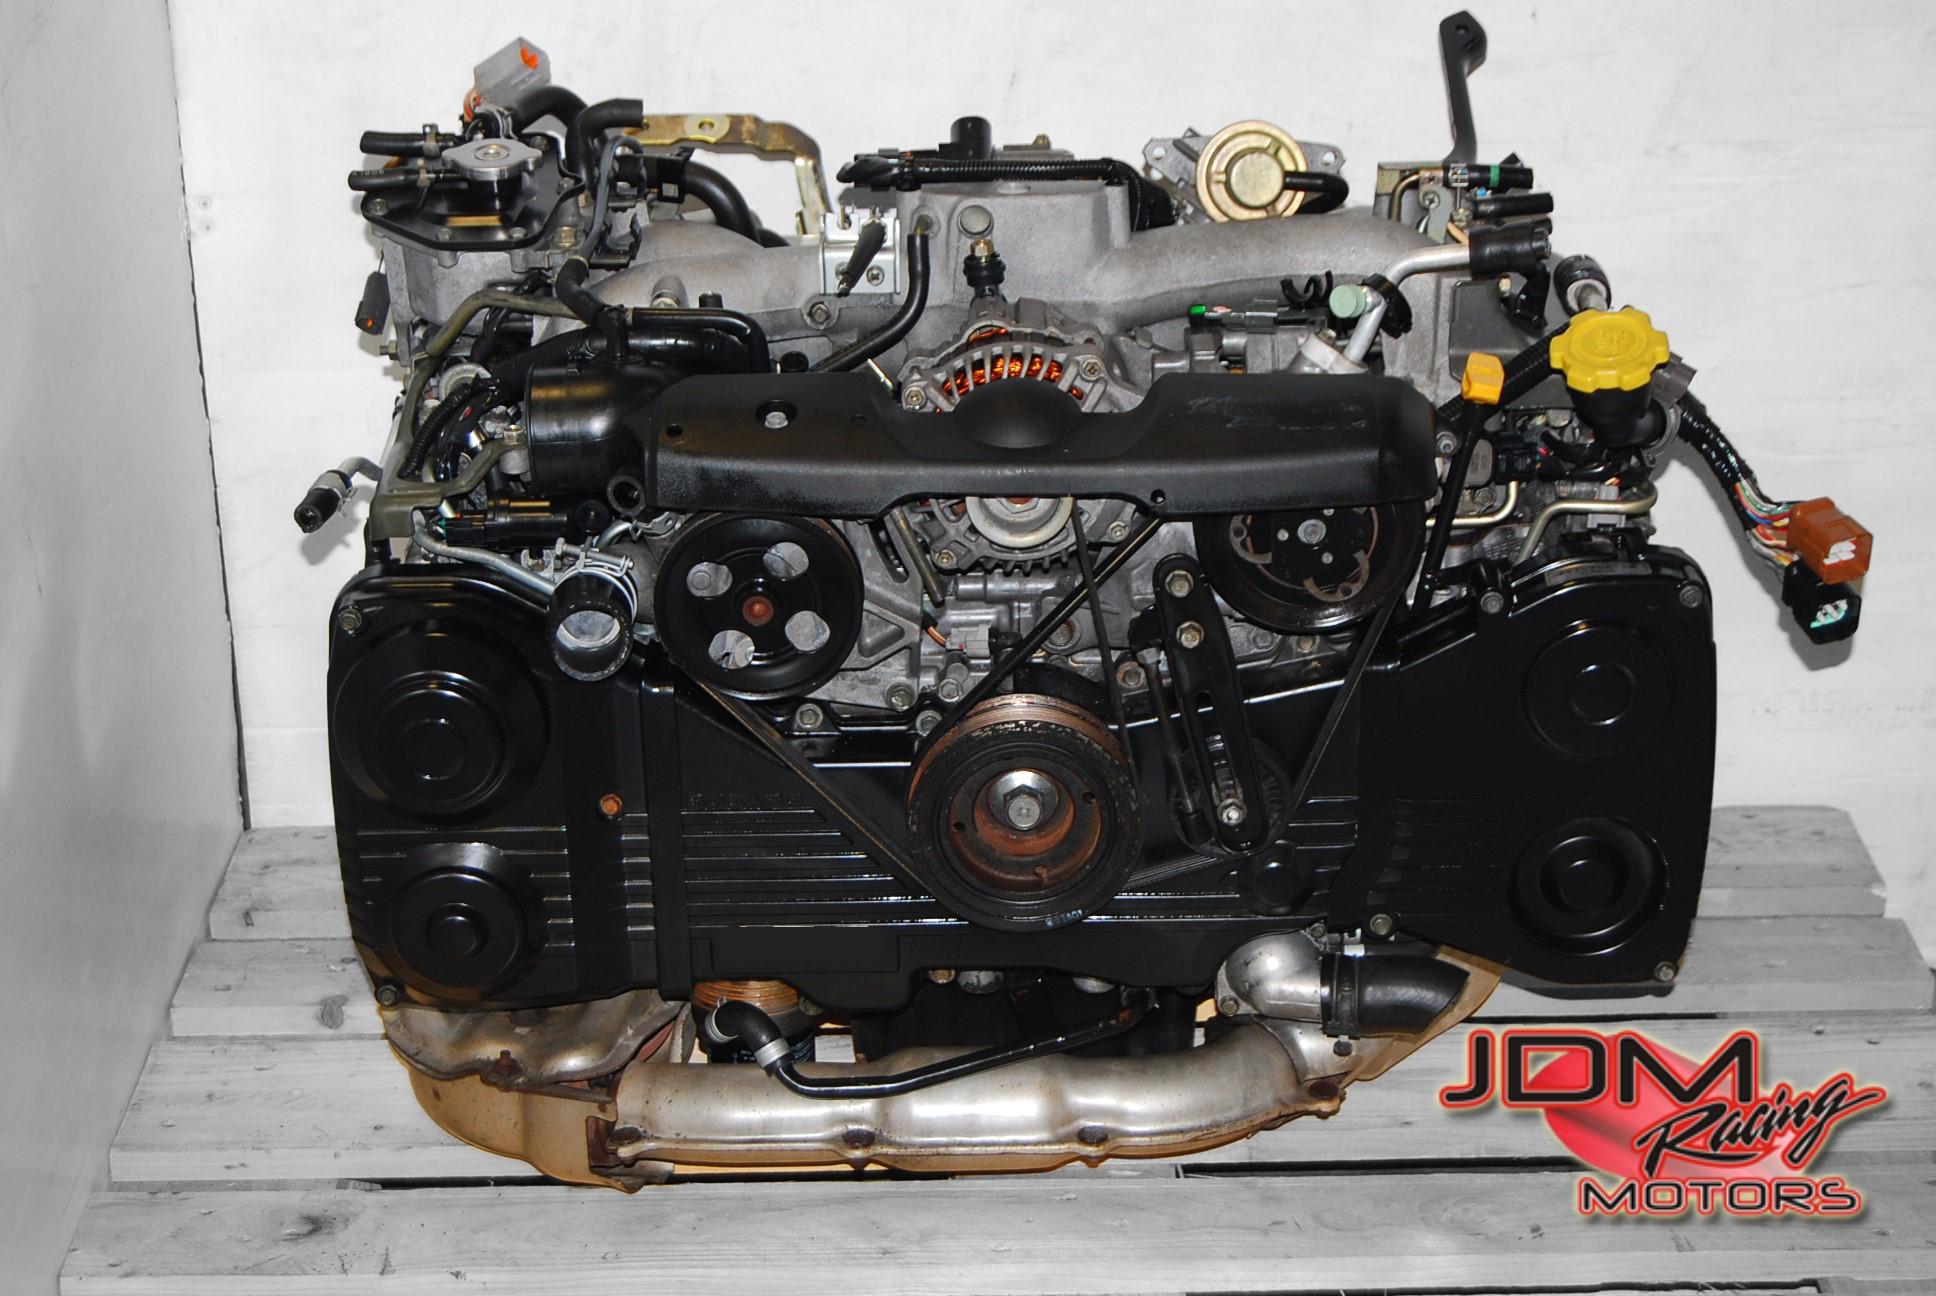 hight resolution of item title ej205 motors impreza wrx